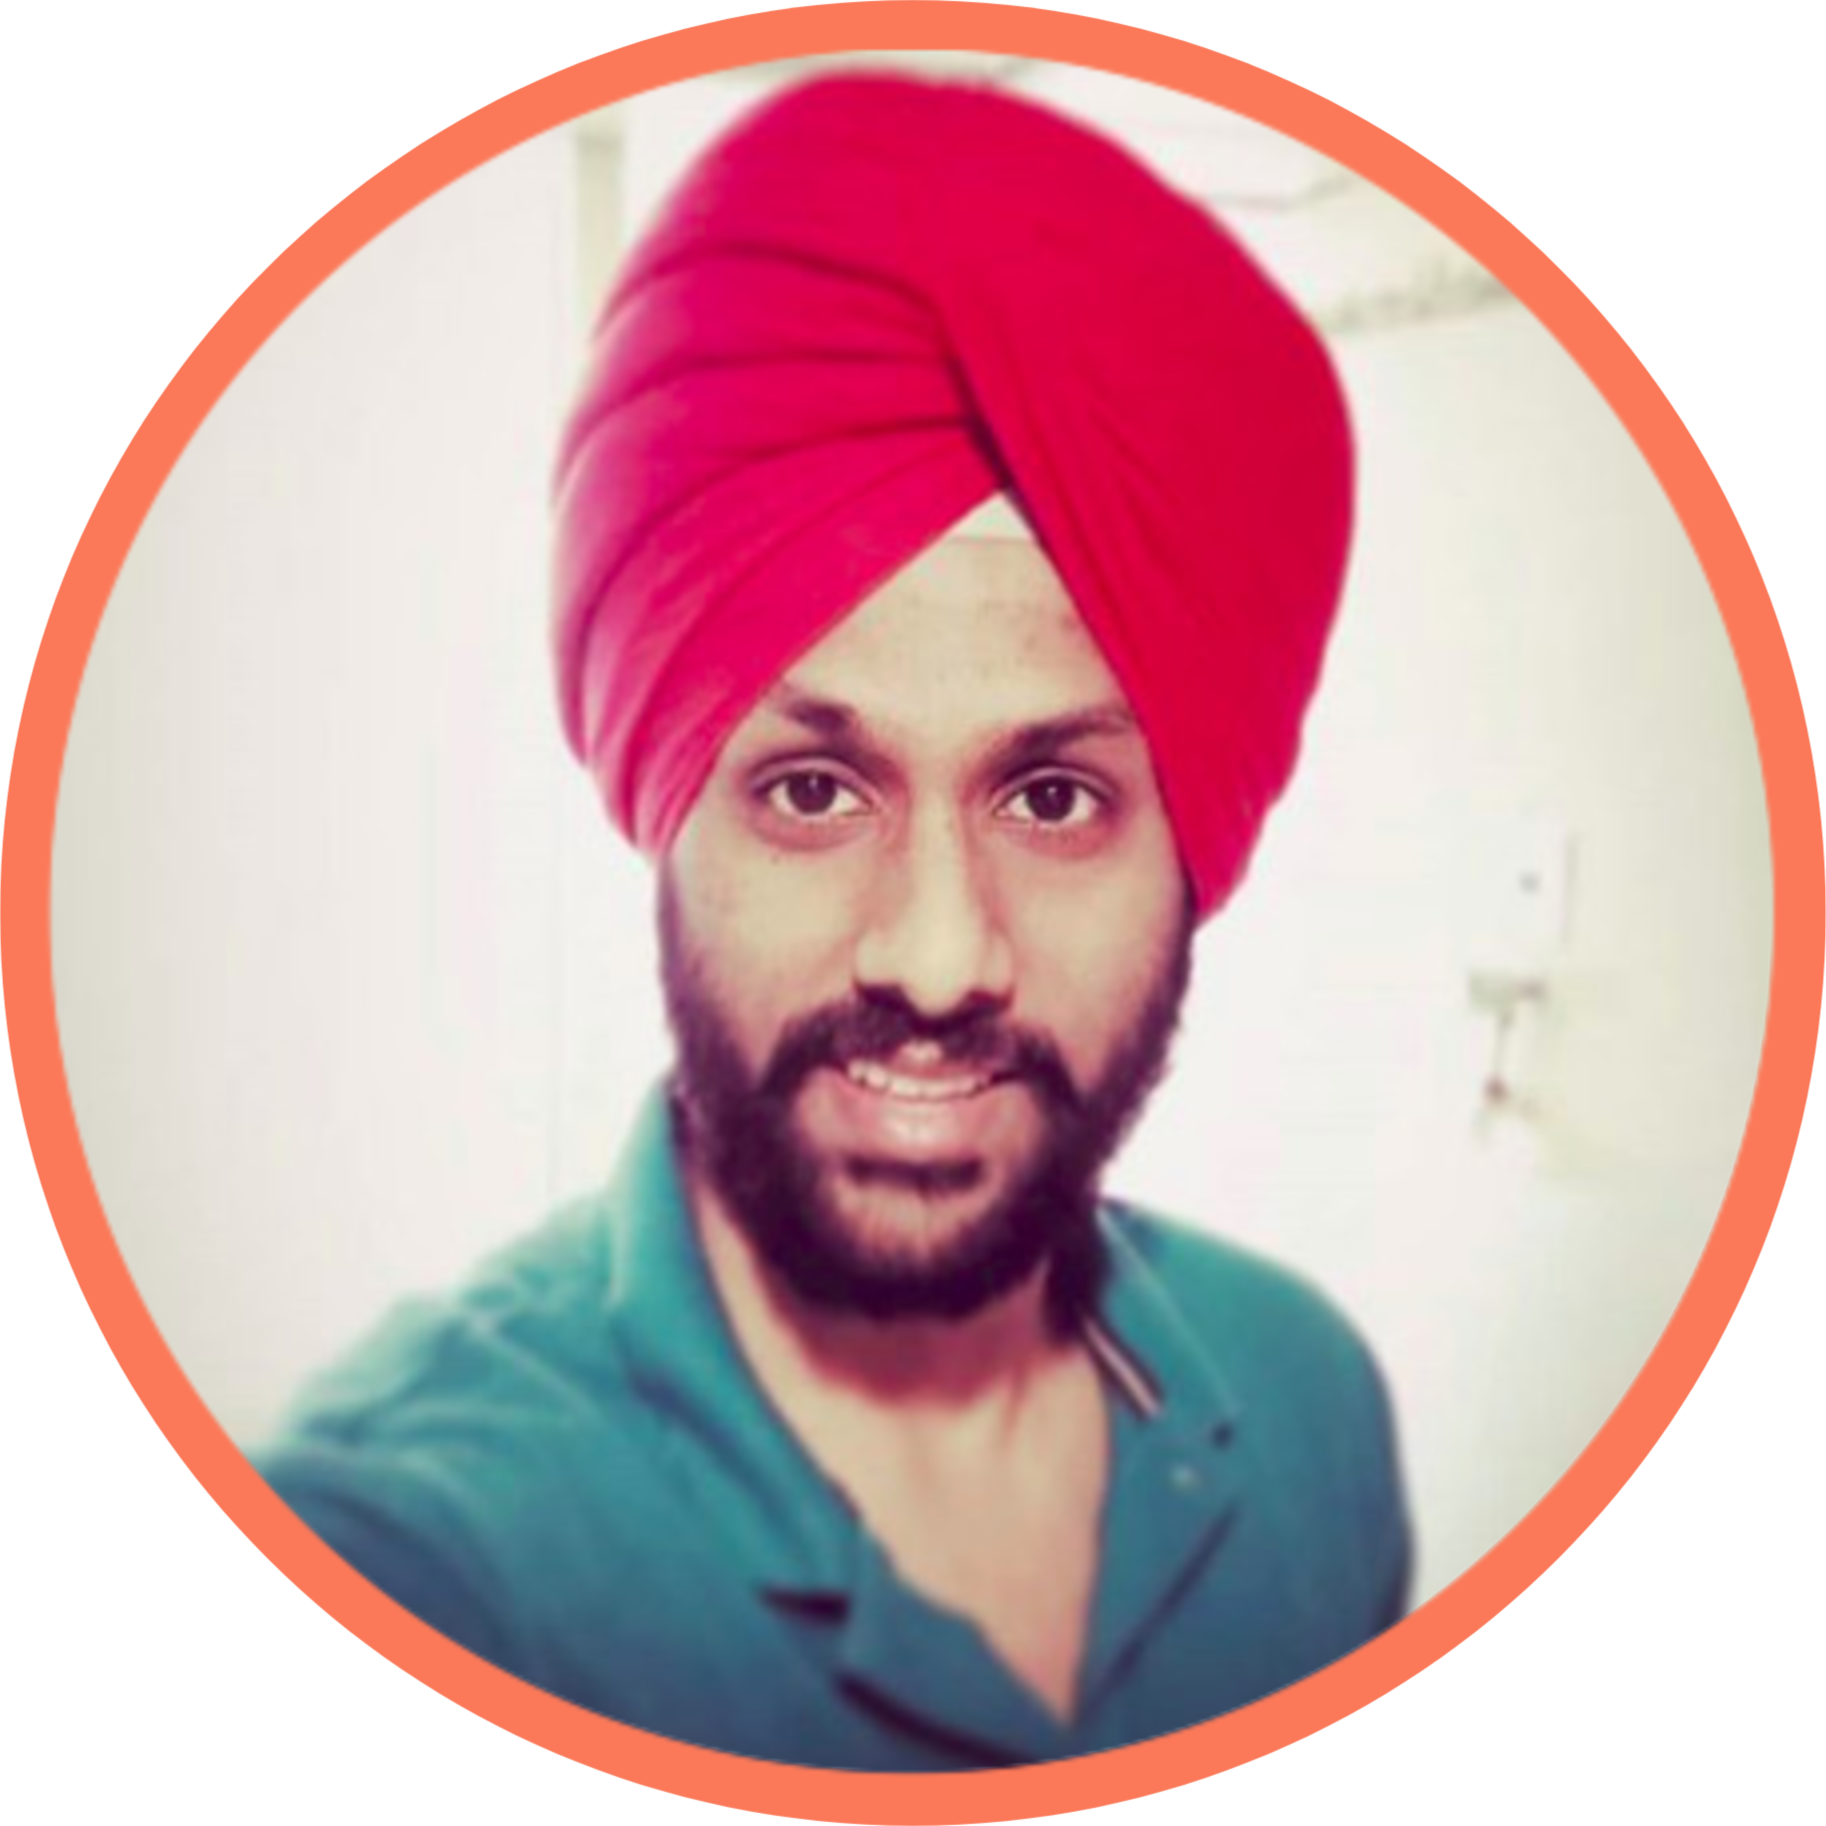 Adhiep-Singh